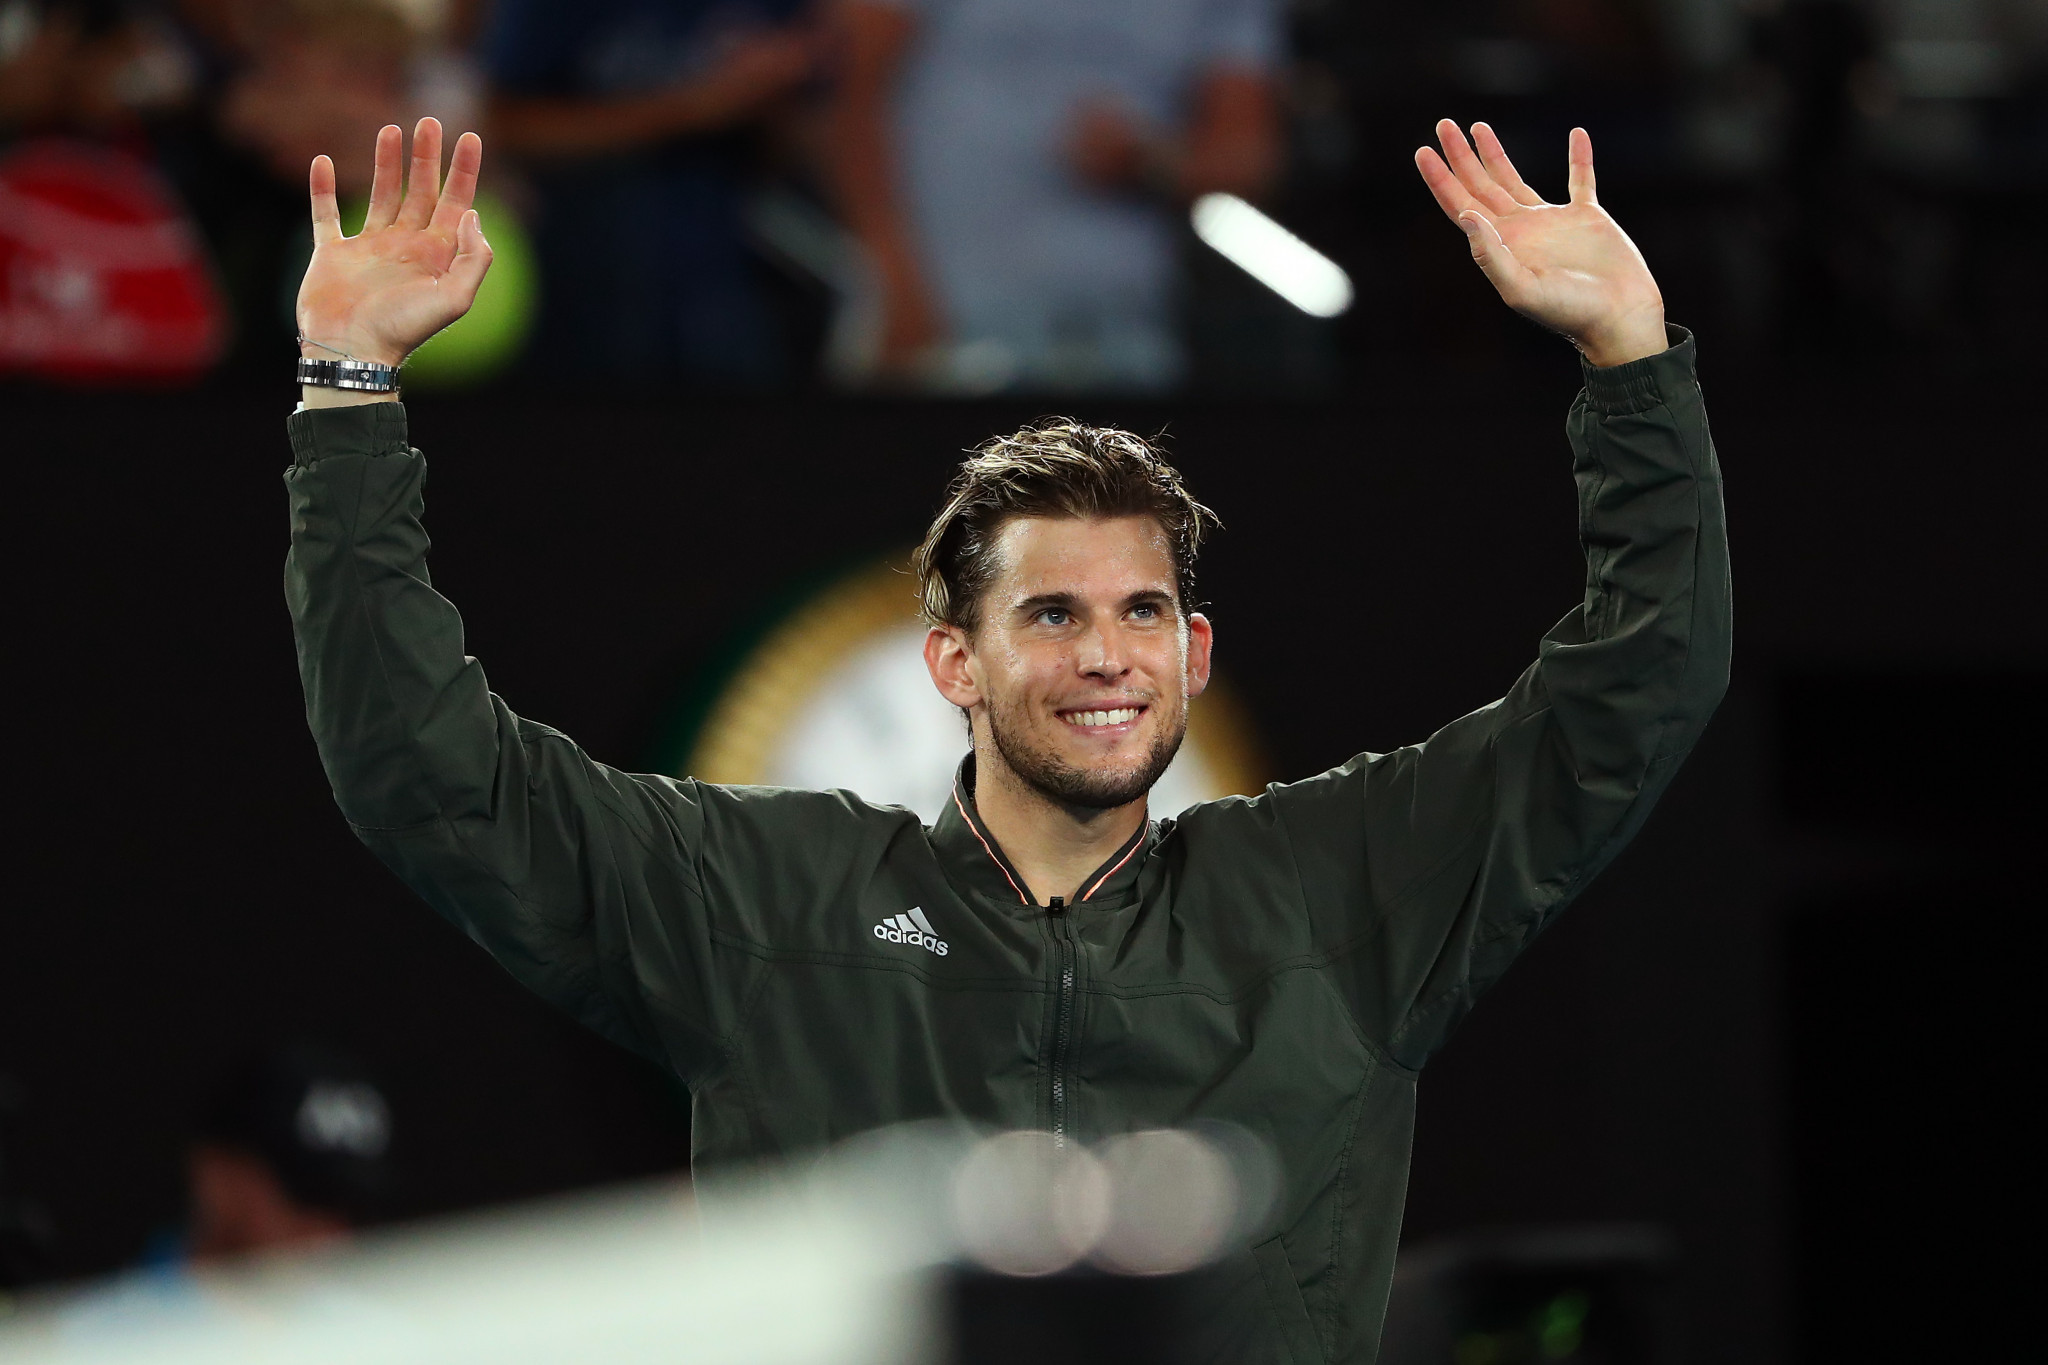 Thiem will face Serbian Novak Djokovic in the final ©Getty Images